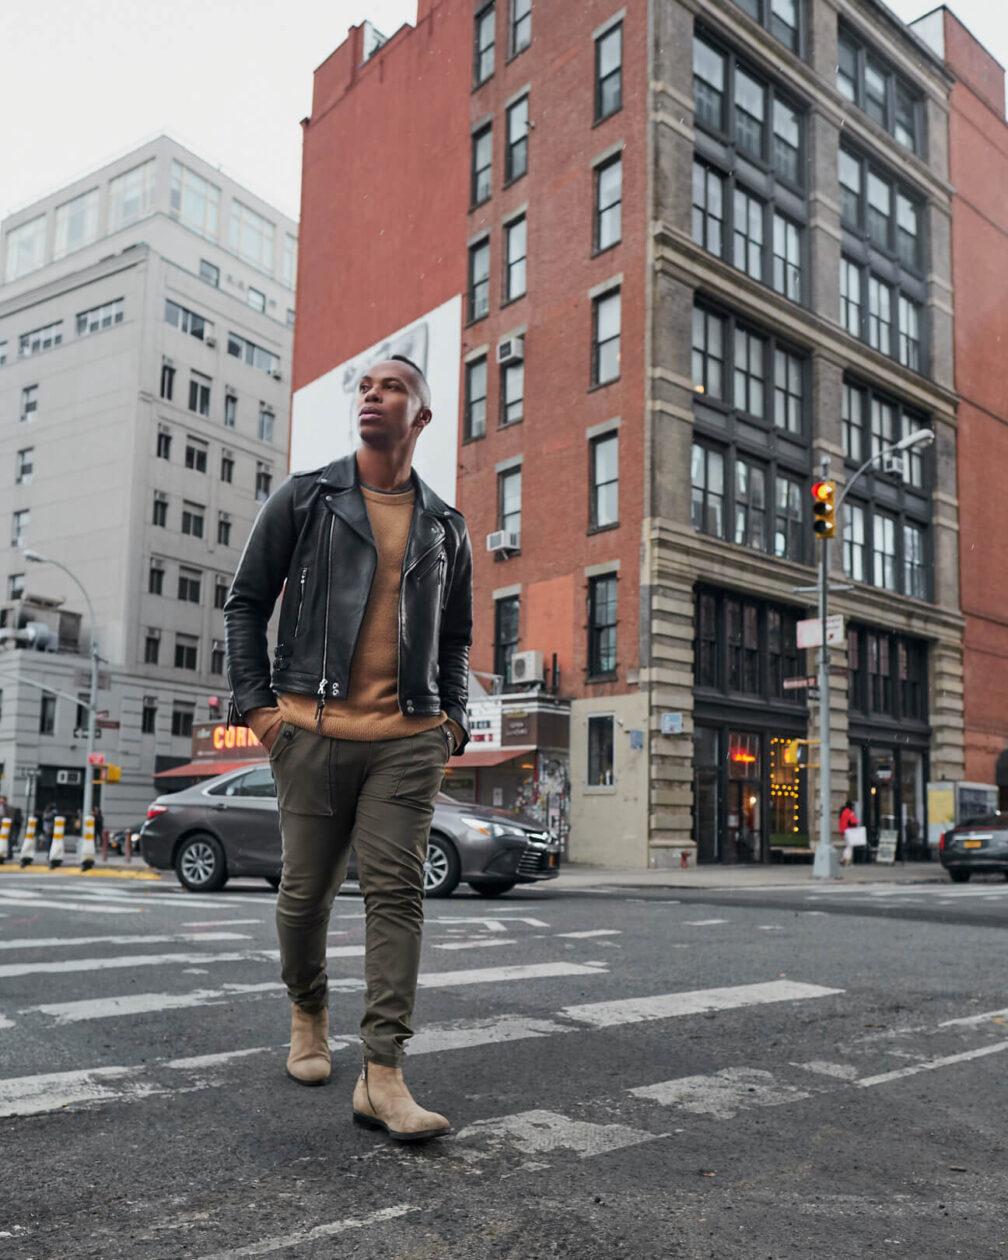 Fuji X Pro2 with xf 16mm f1.4 -Frank and Oak Men's Fashion Photography in SoHo New York walking across the street - Model: Rashad